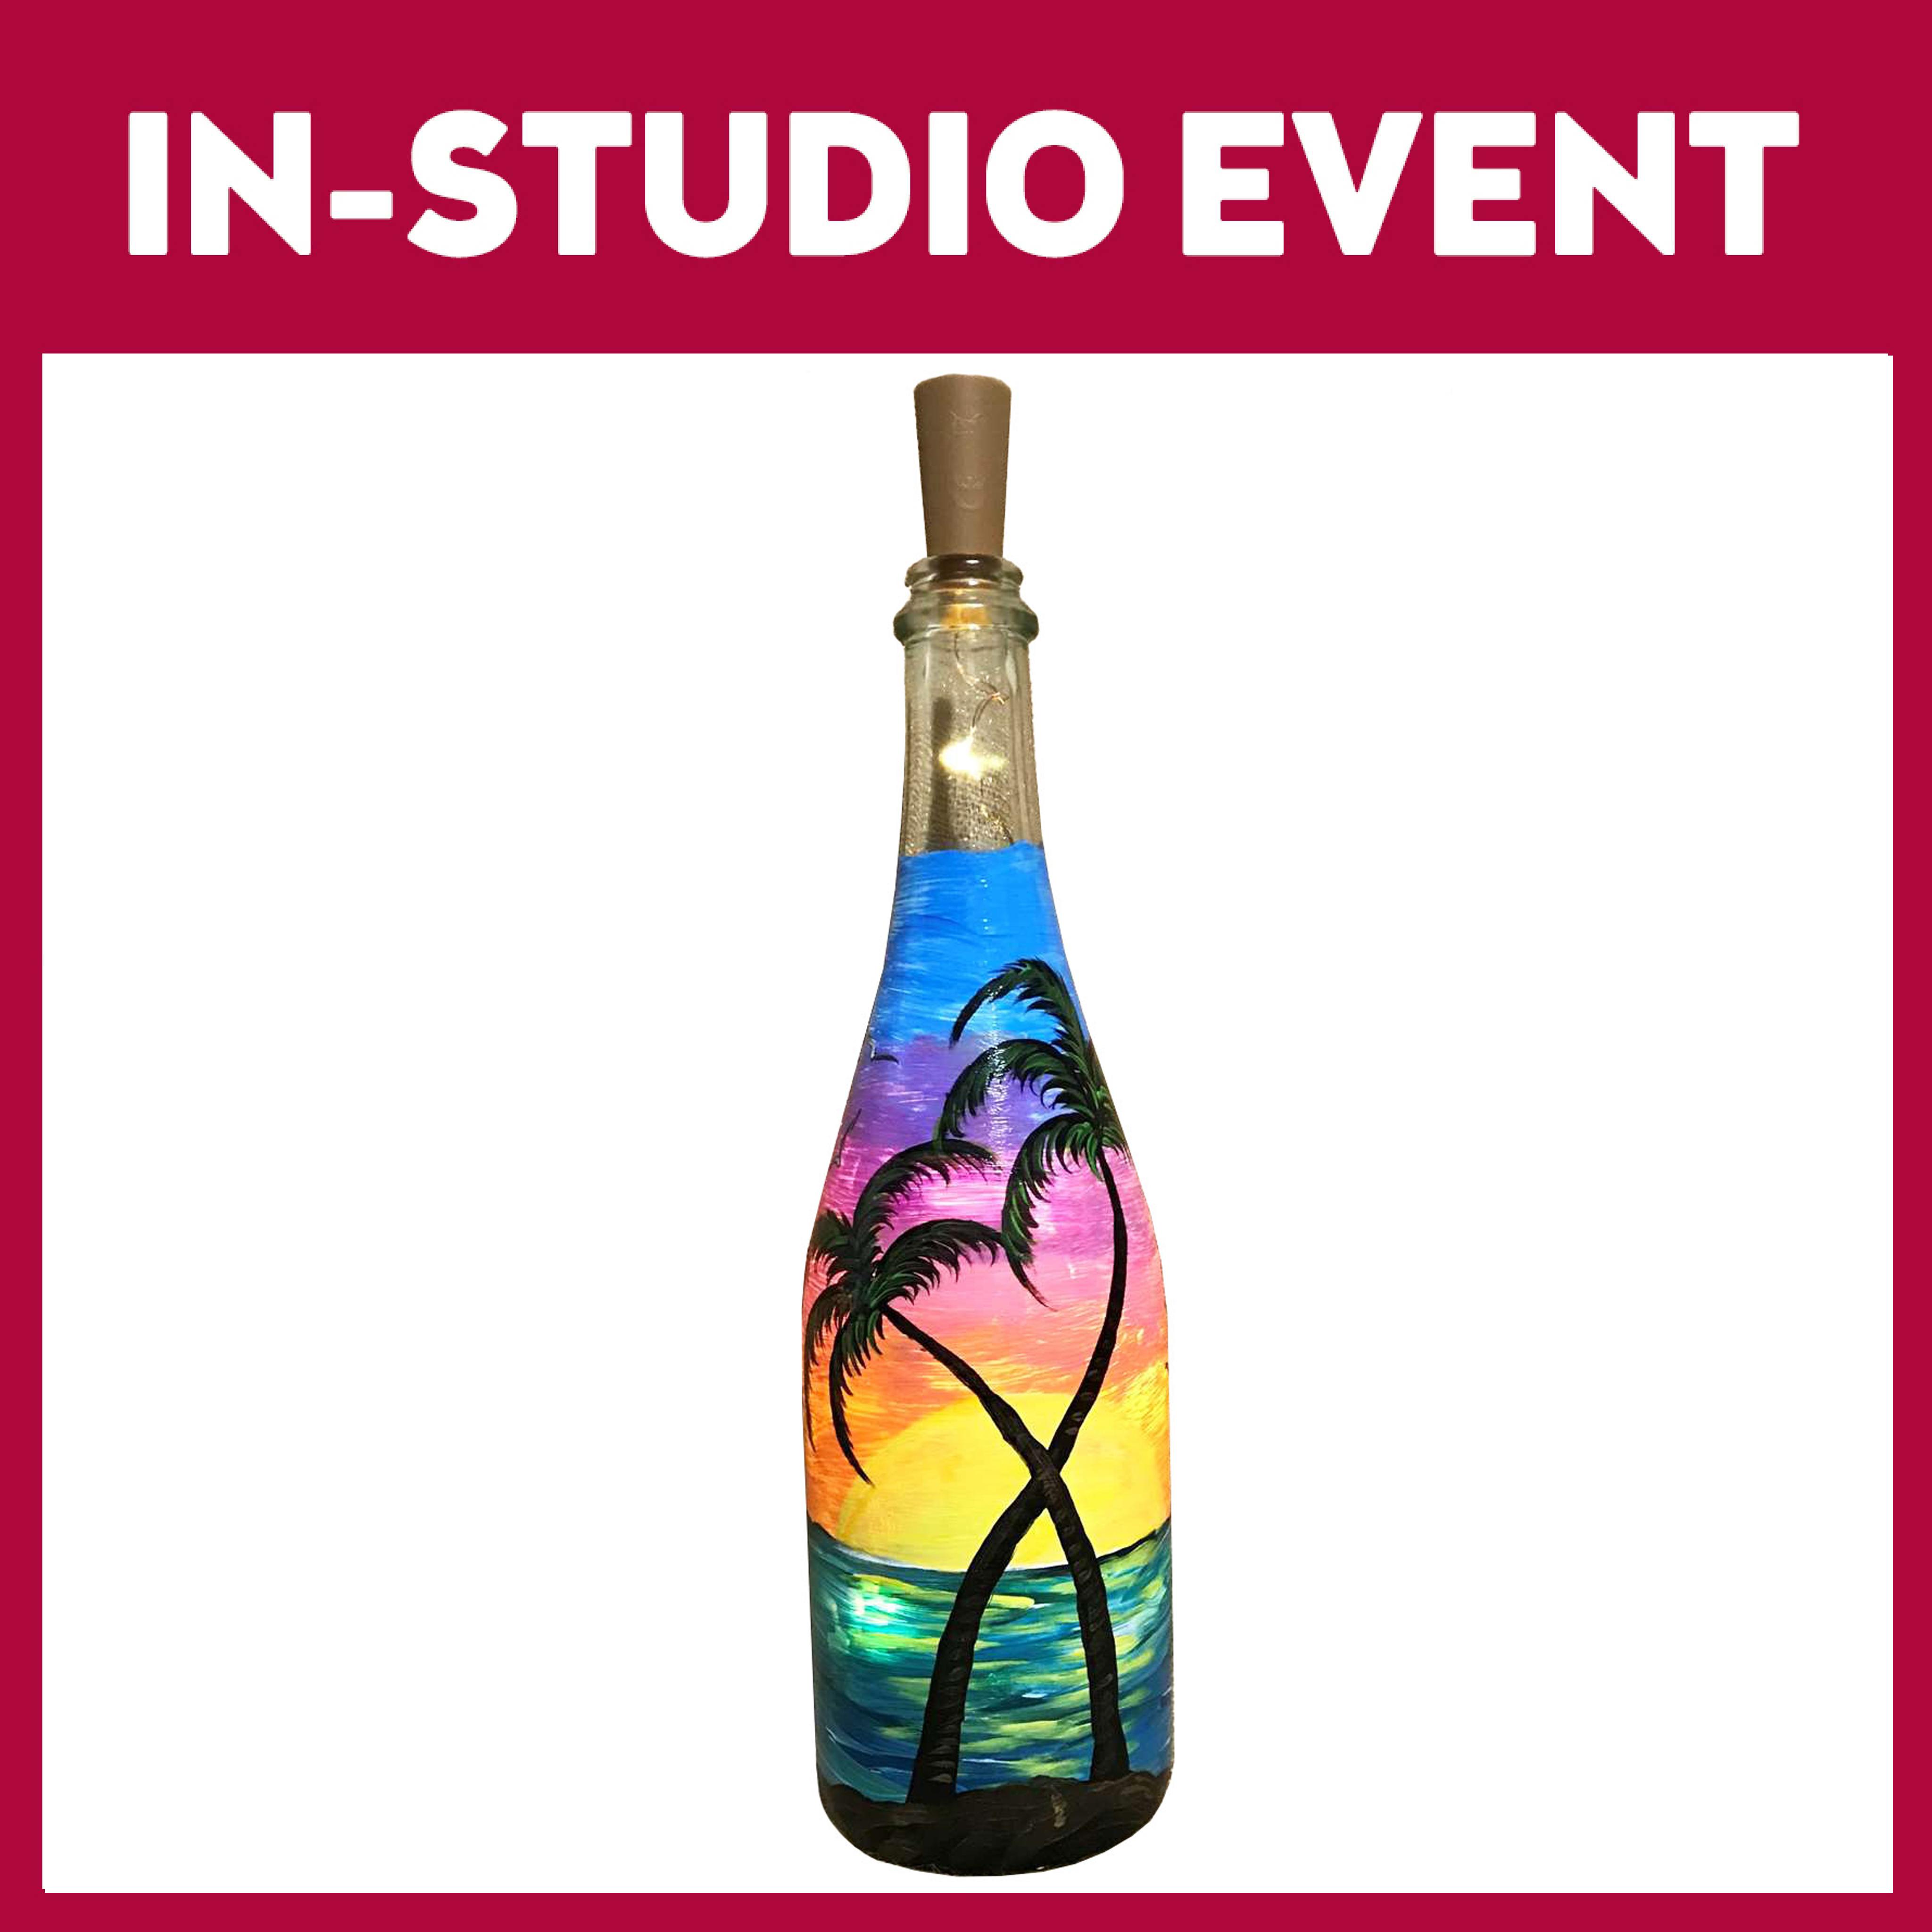 Wine Down at Sunset - Wine Bottle